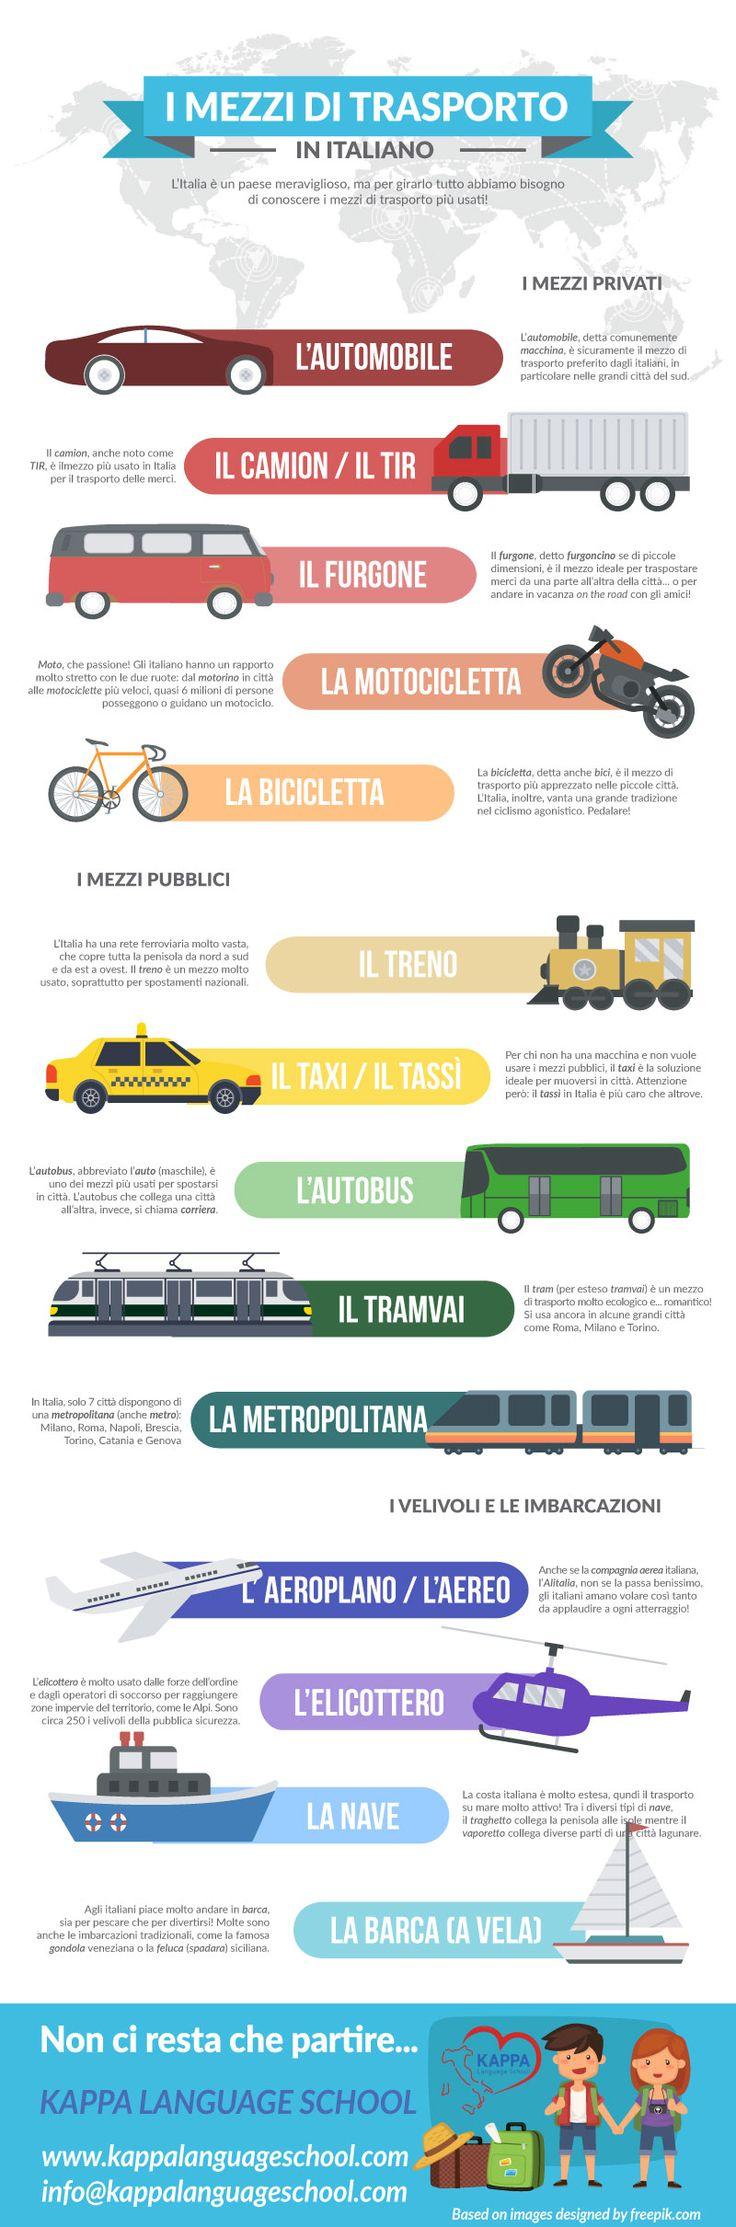 Learn Italian Words: i mezzi di trasporto